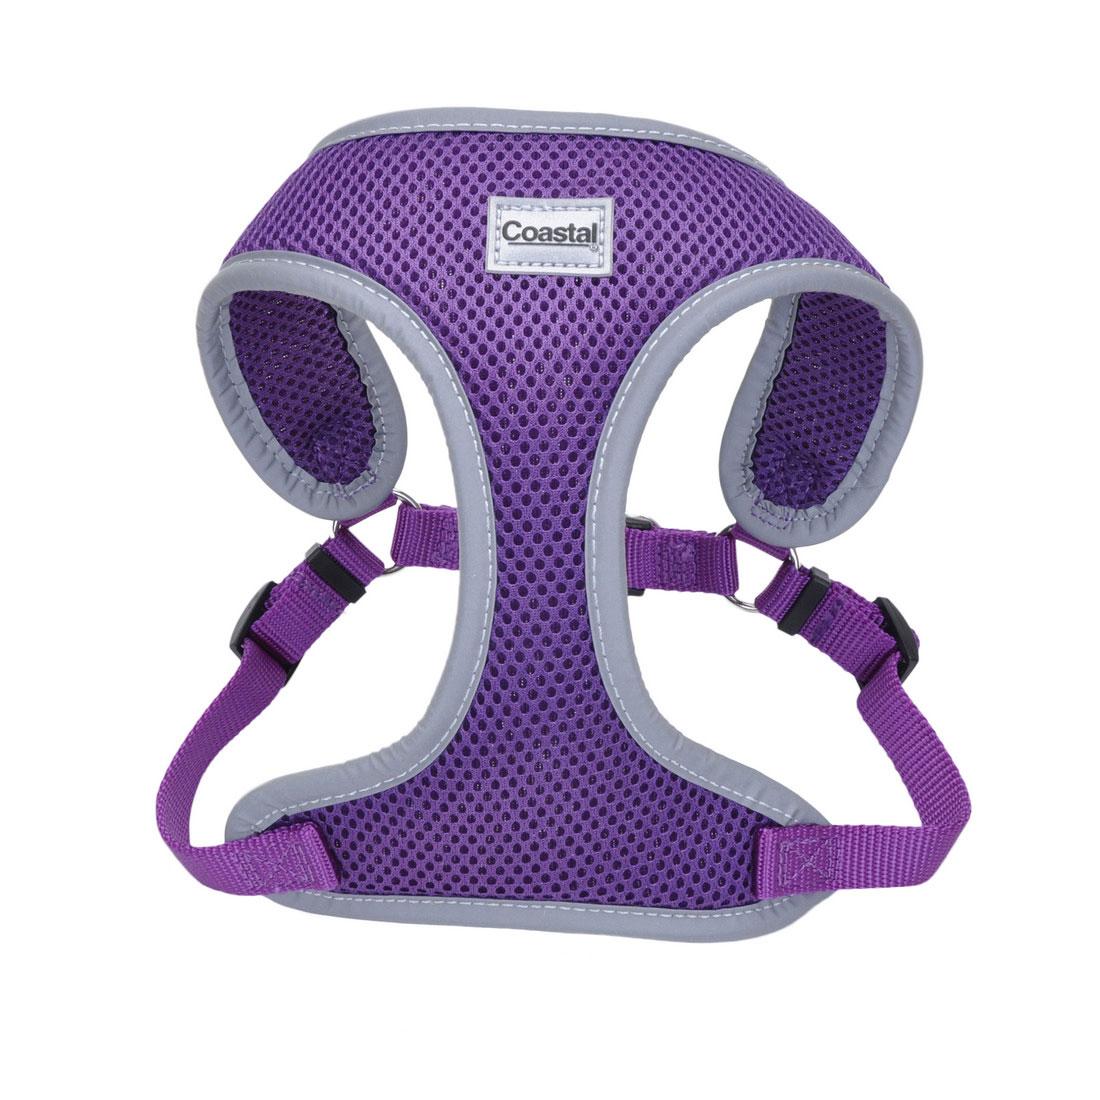 Coastal Comfort Soft Reflective Wrap Adjustable Dog Harness, Purple, X-Small